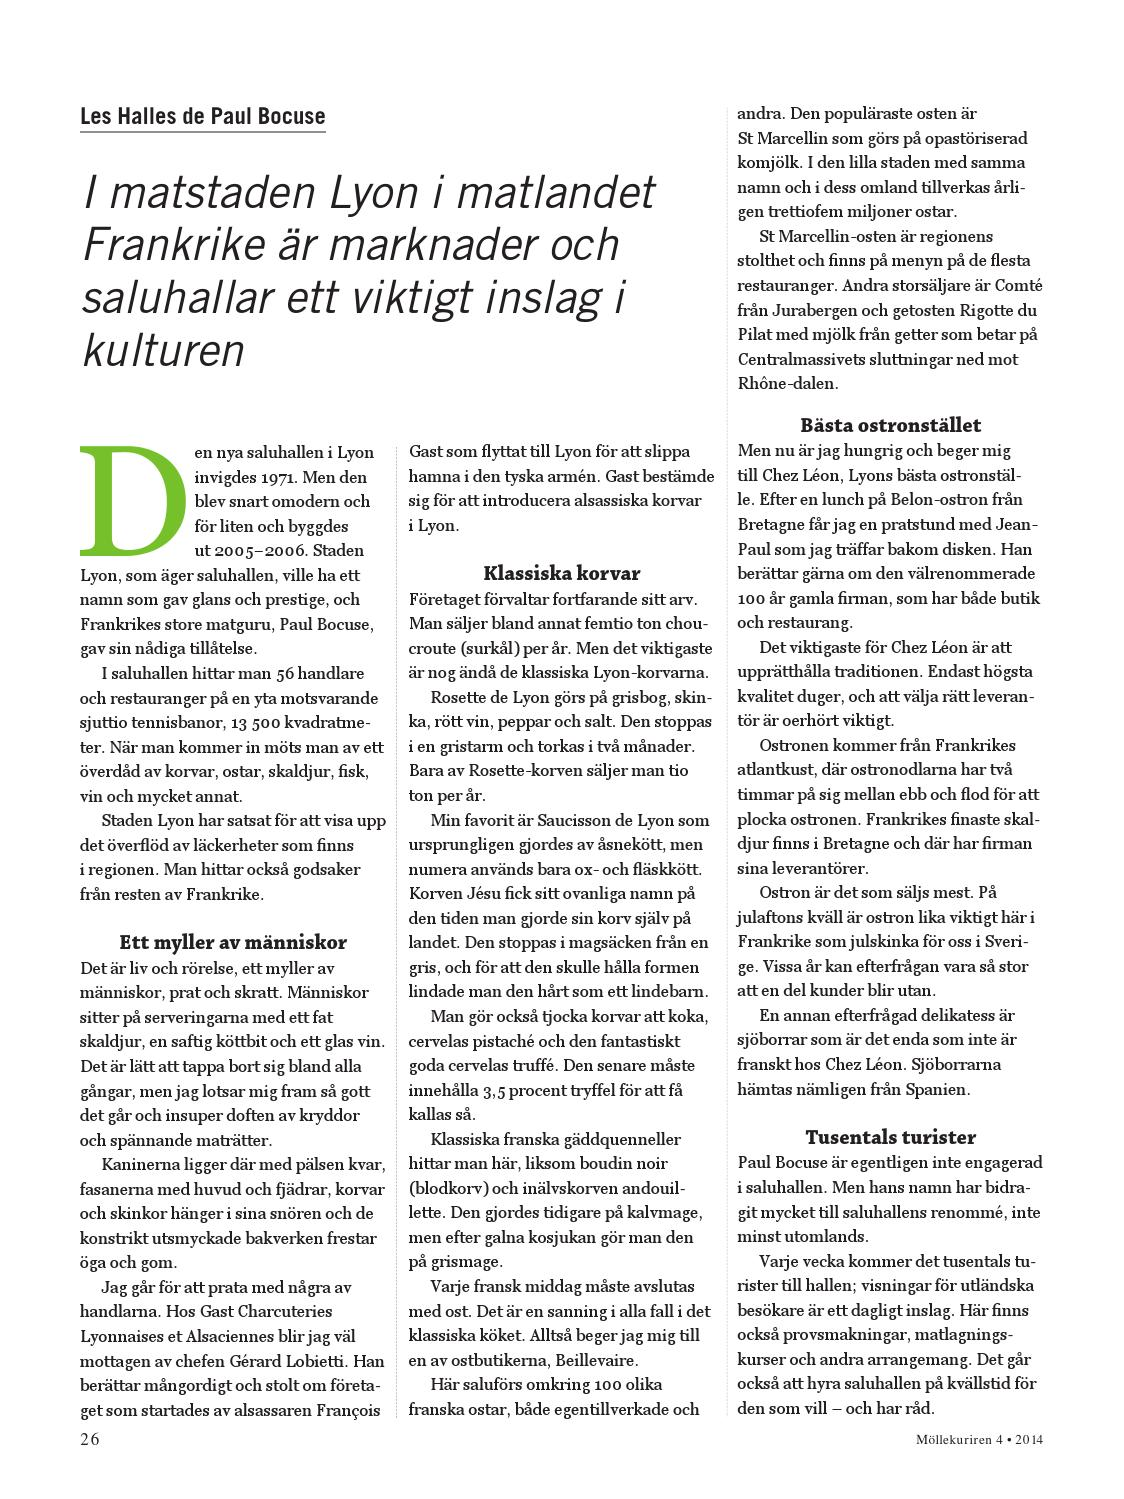 Mollekuriren 2014 Nummer 4 By Molle By Och Kulturforening Issuu